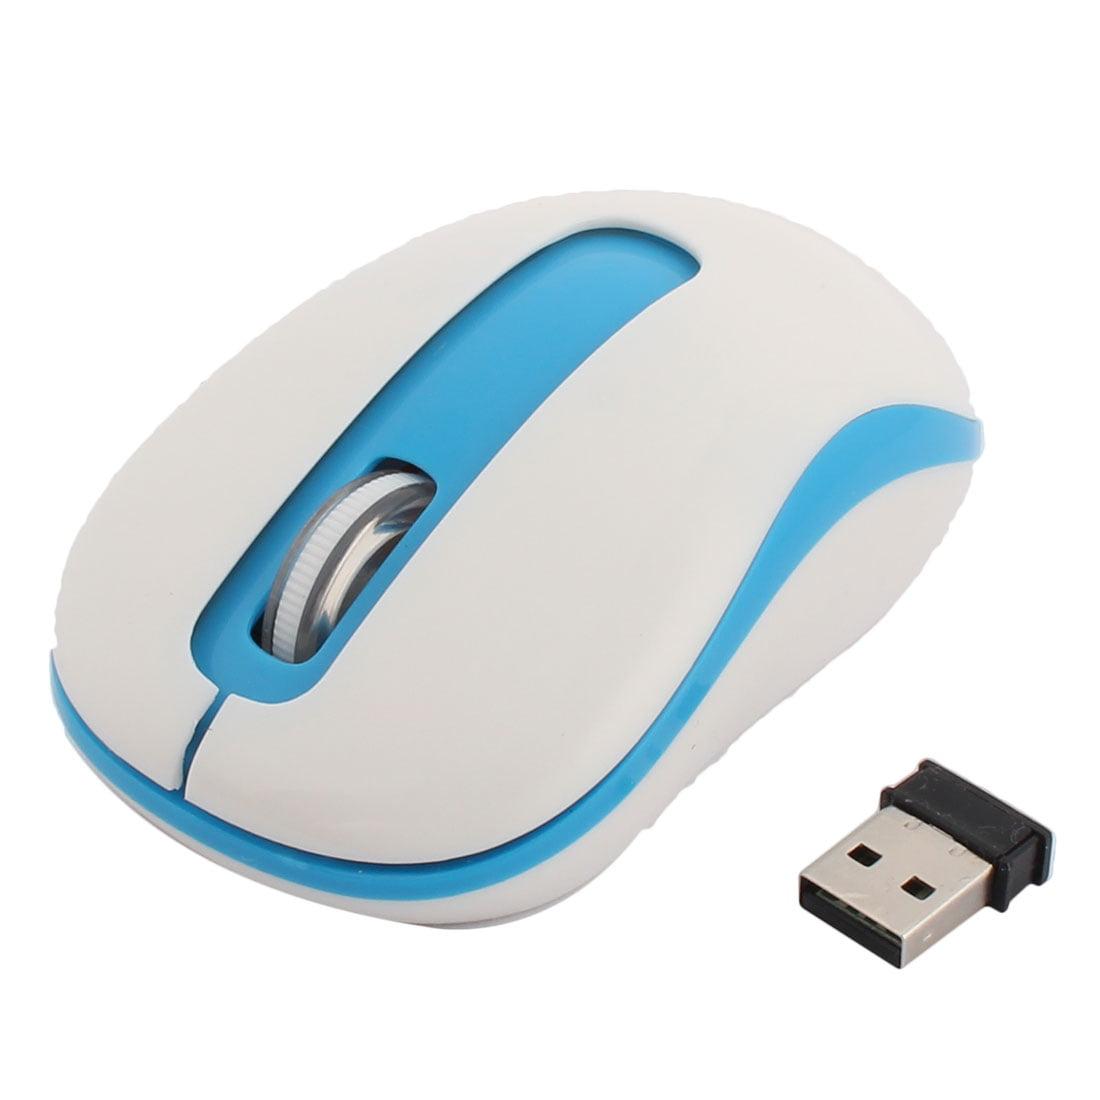 Unique Bargains Computer Wireless Portable USB Receiver Mobile Optical Mouse White Blue